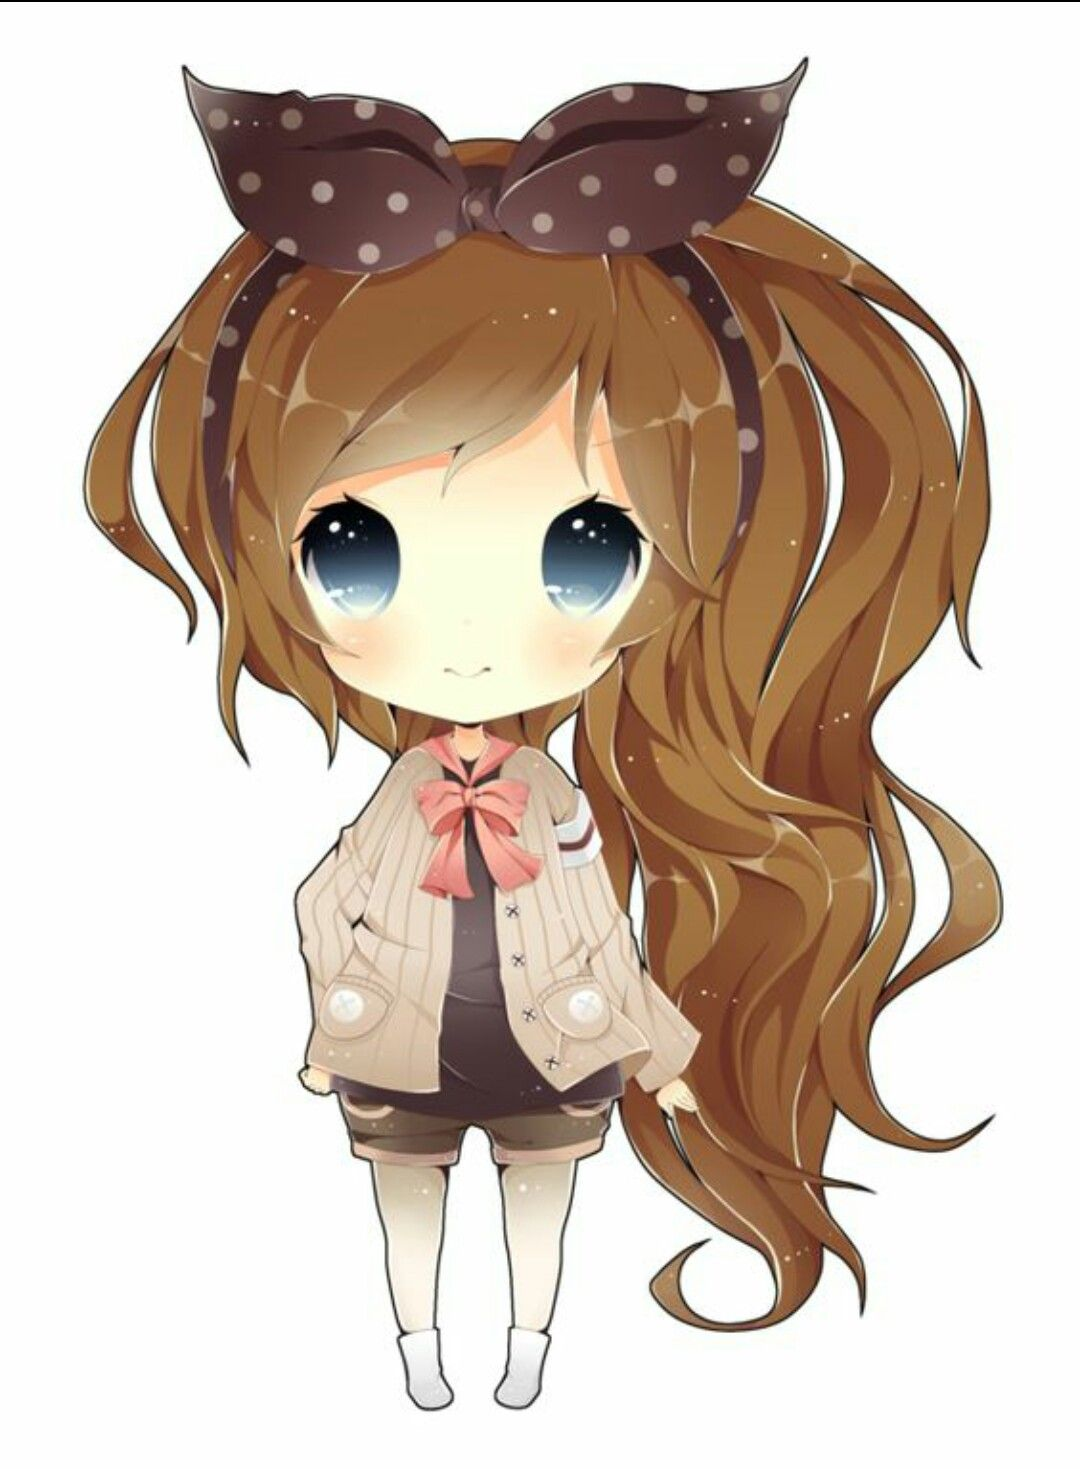 Pin by Laiba Mohsina on Anime | Pinterest | Anime